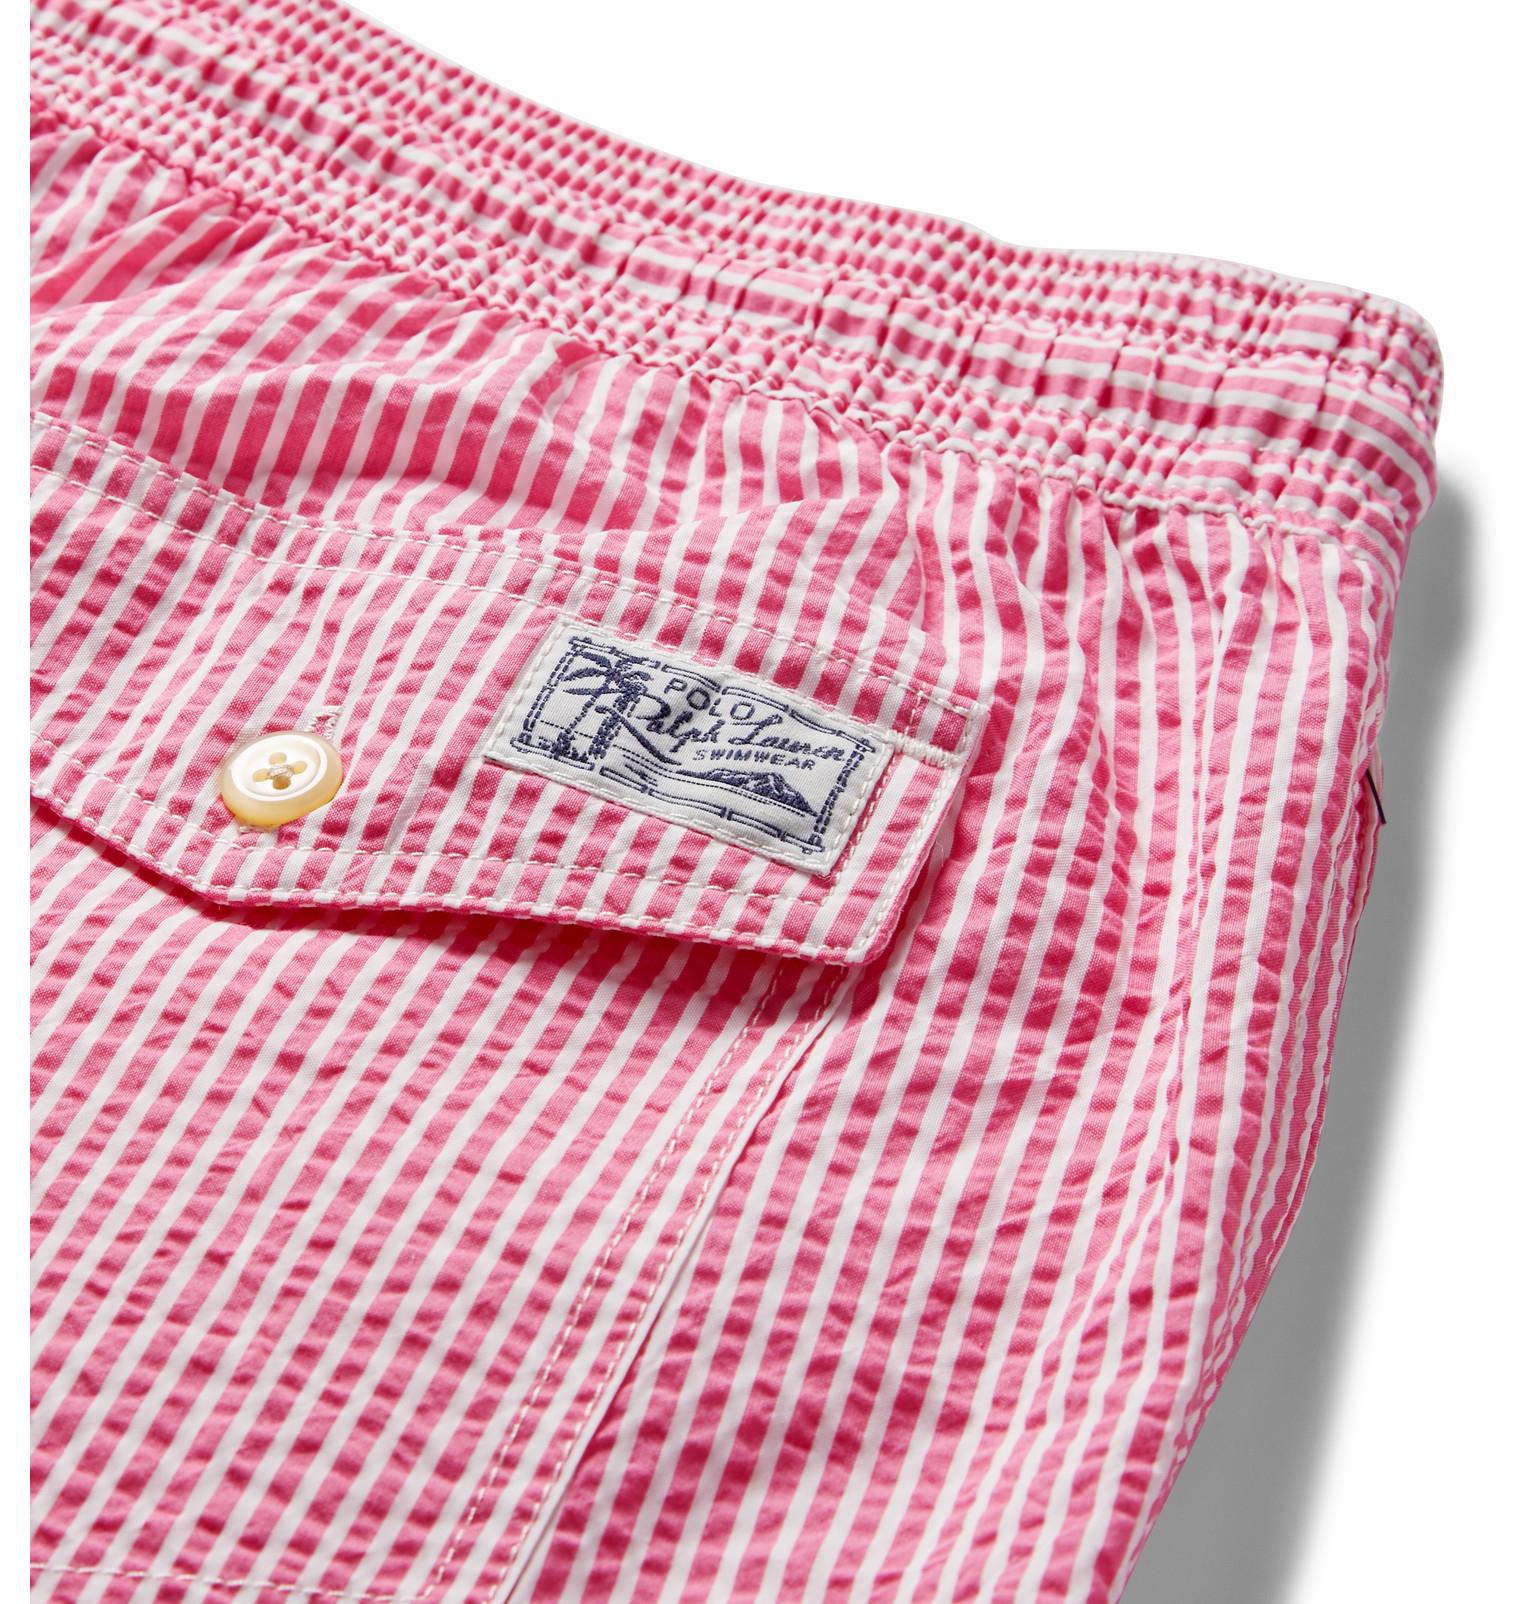 22e7d7361b ... closeout polo ralph lauren traveler striped seersucker swim shorts in  pink 7ec43 894dc